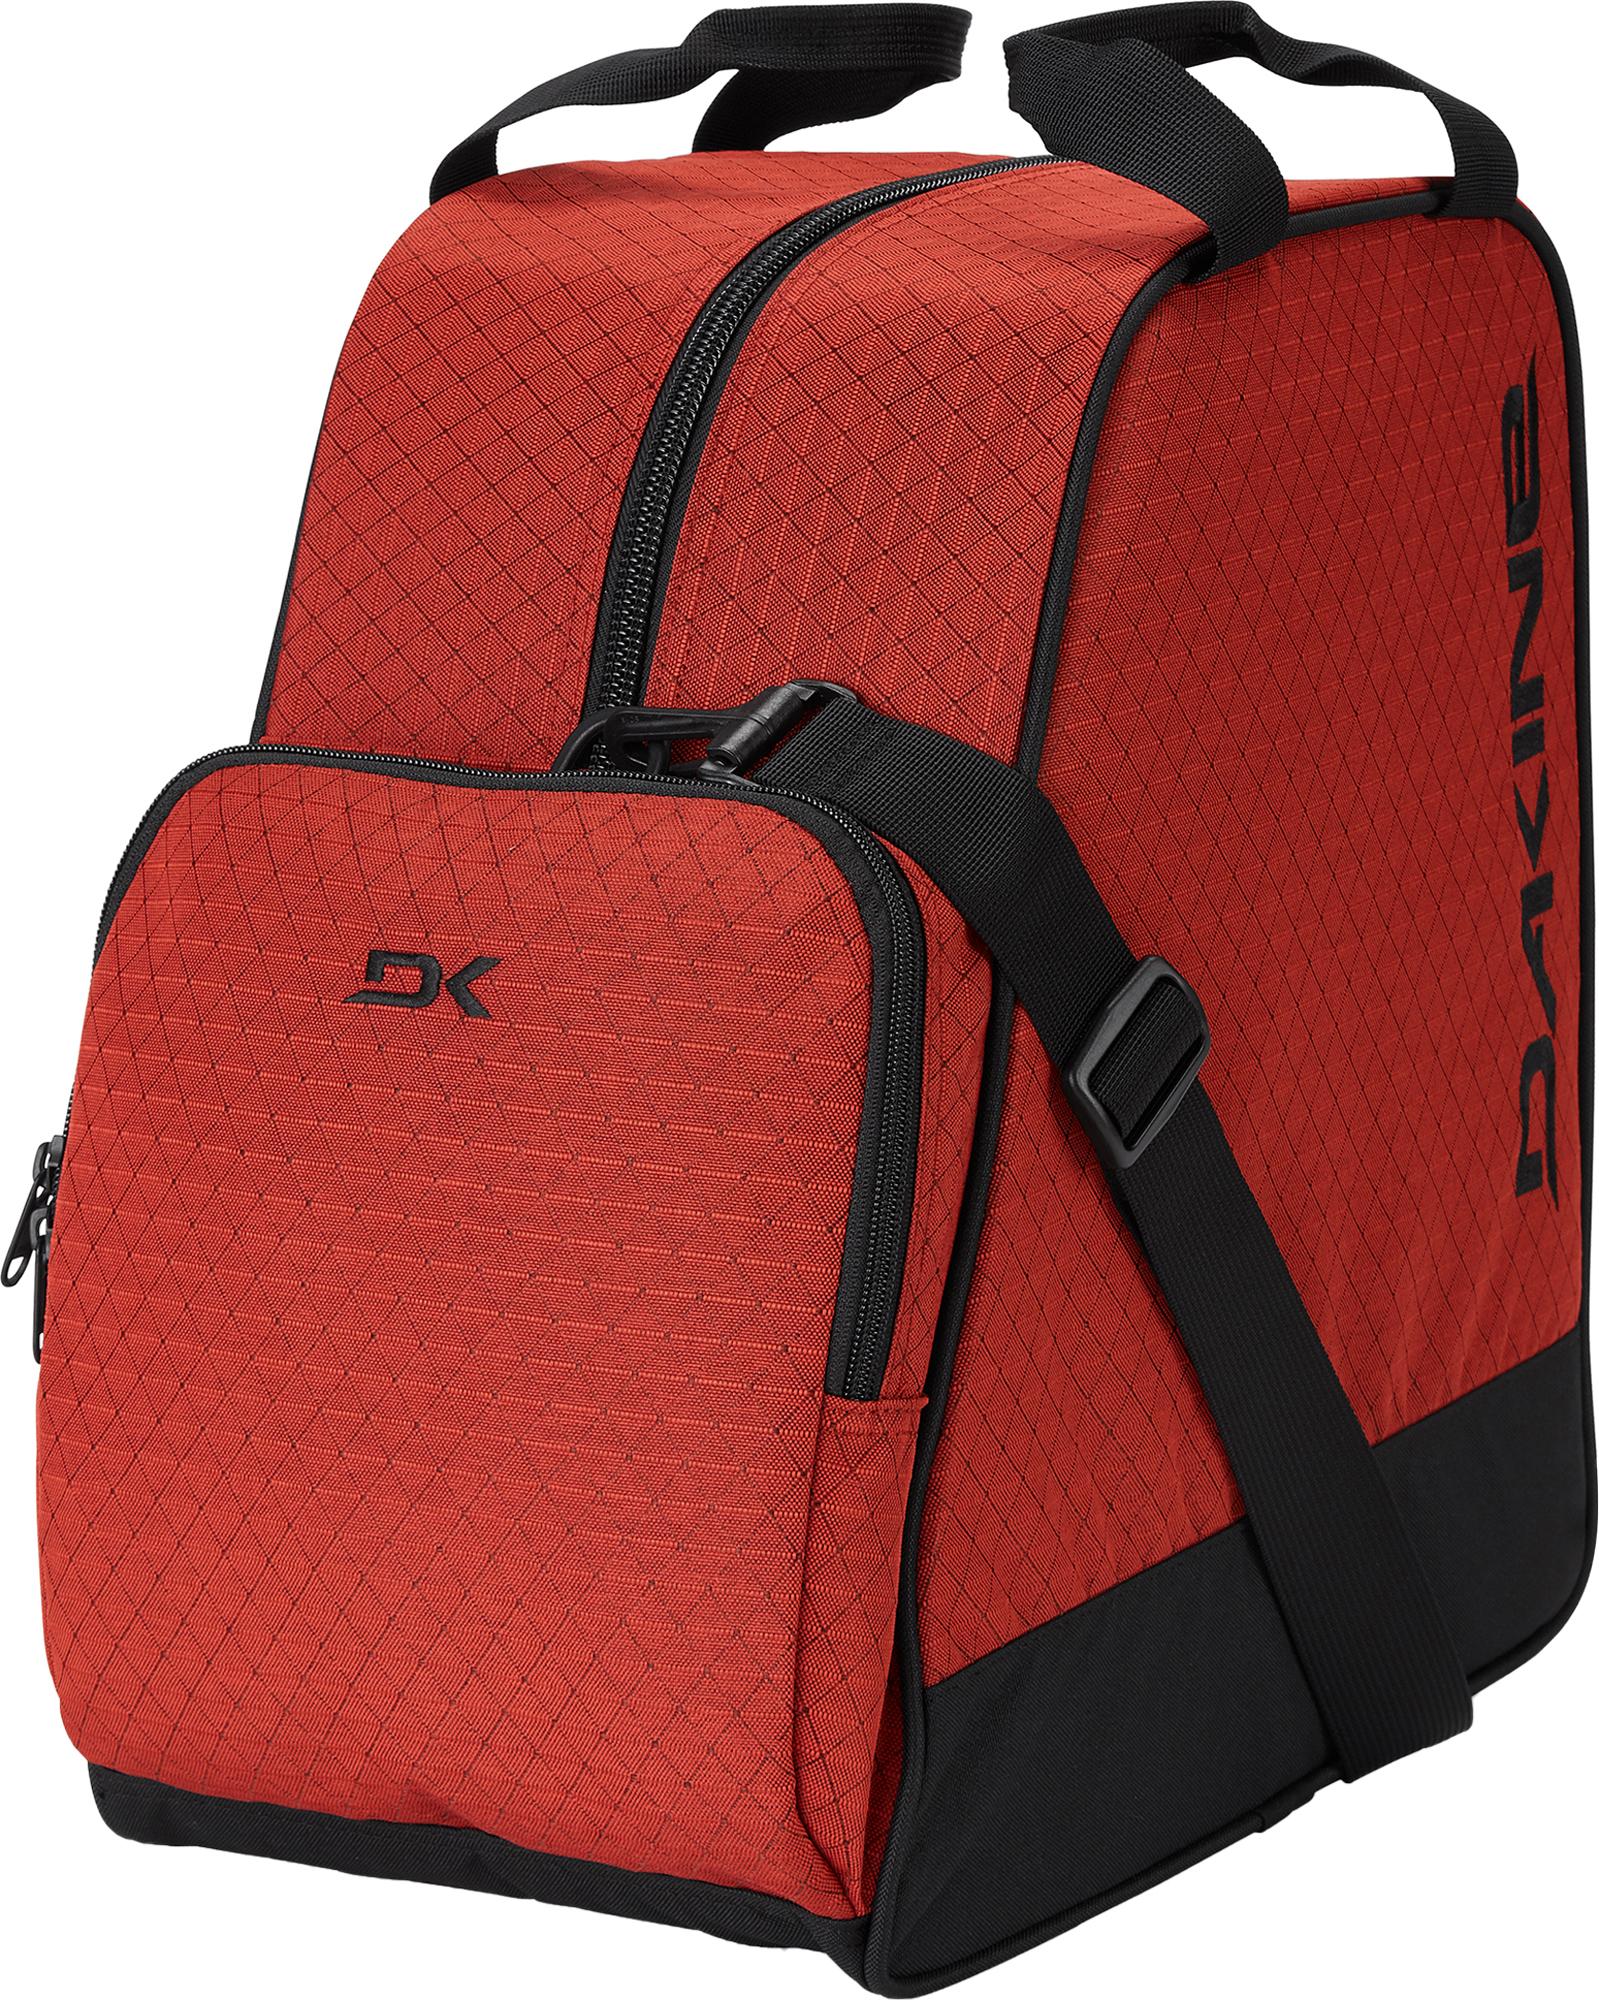 Dakine Сумка для ботинок Dakine BOOT BAG, 30 л сумка спортивная женская dakine nevada